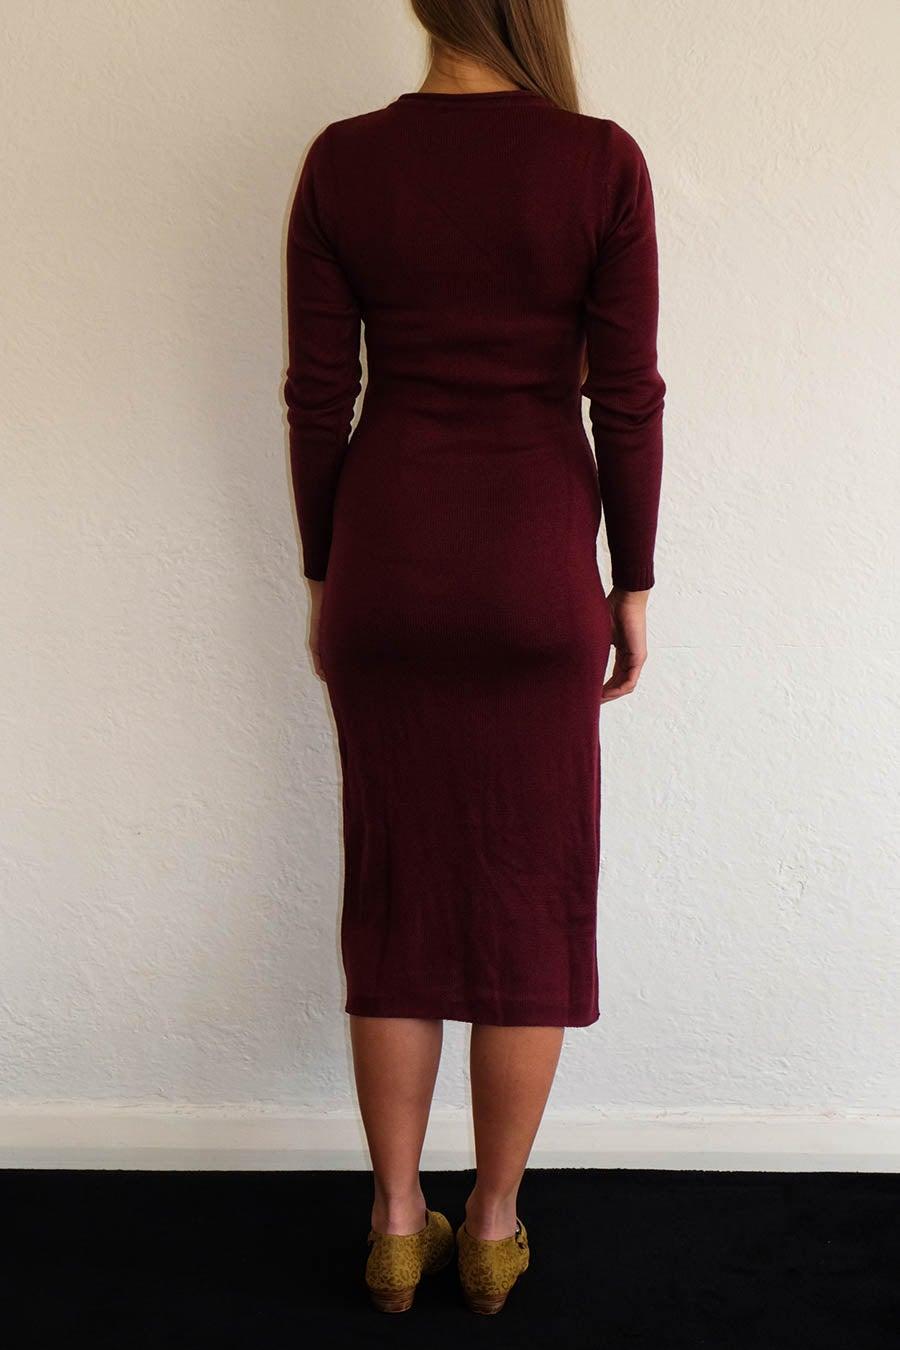 Image of ANKE WINTER DRESS - WINE